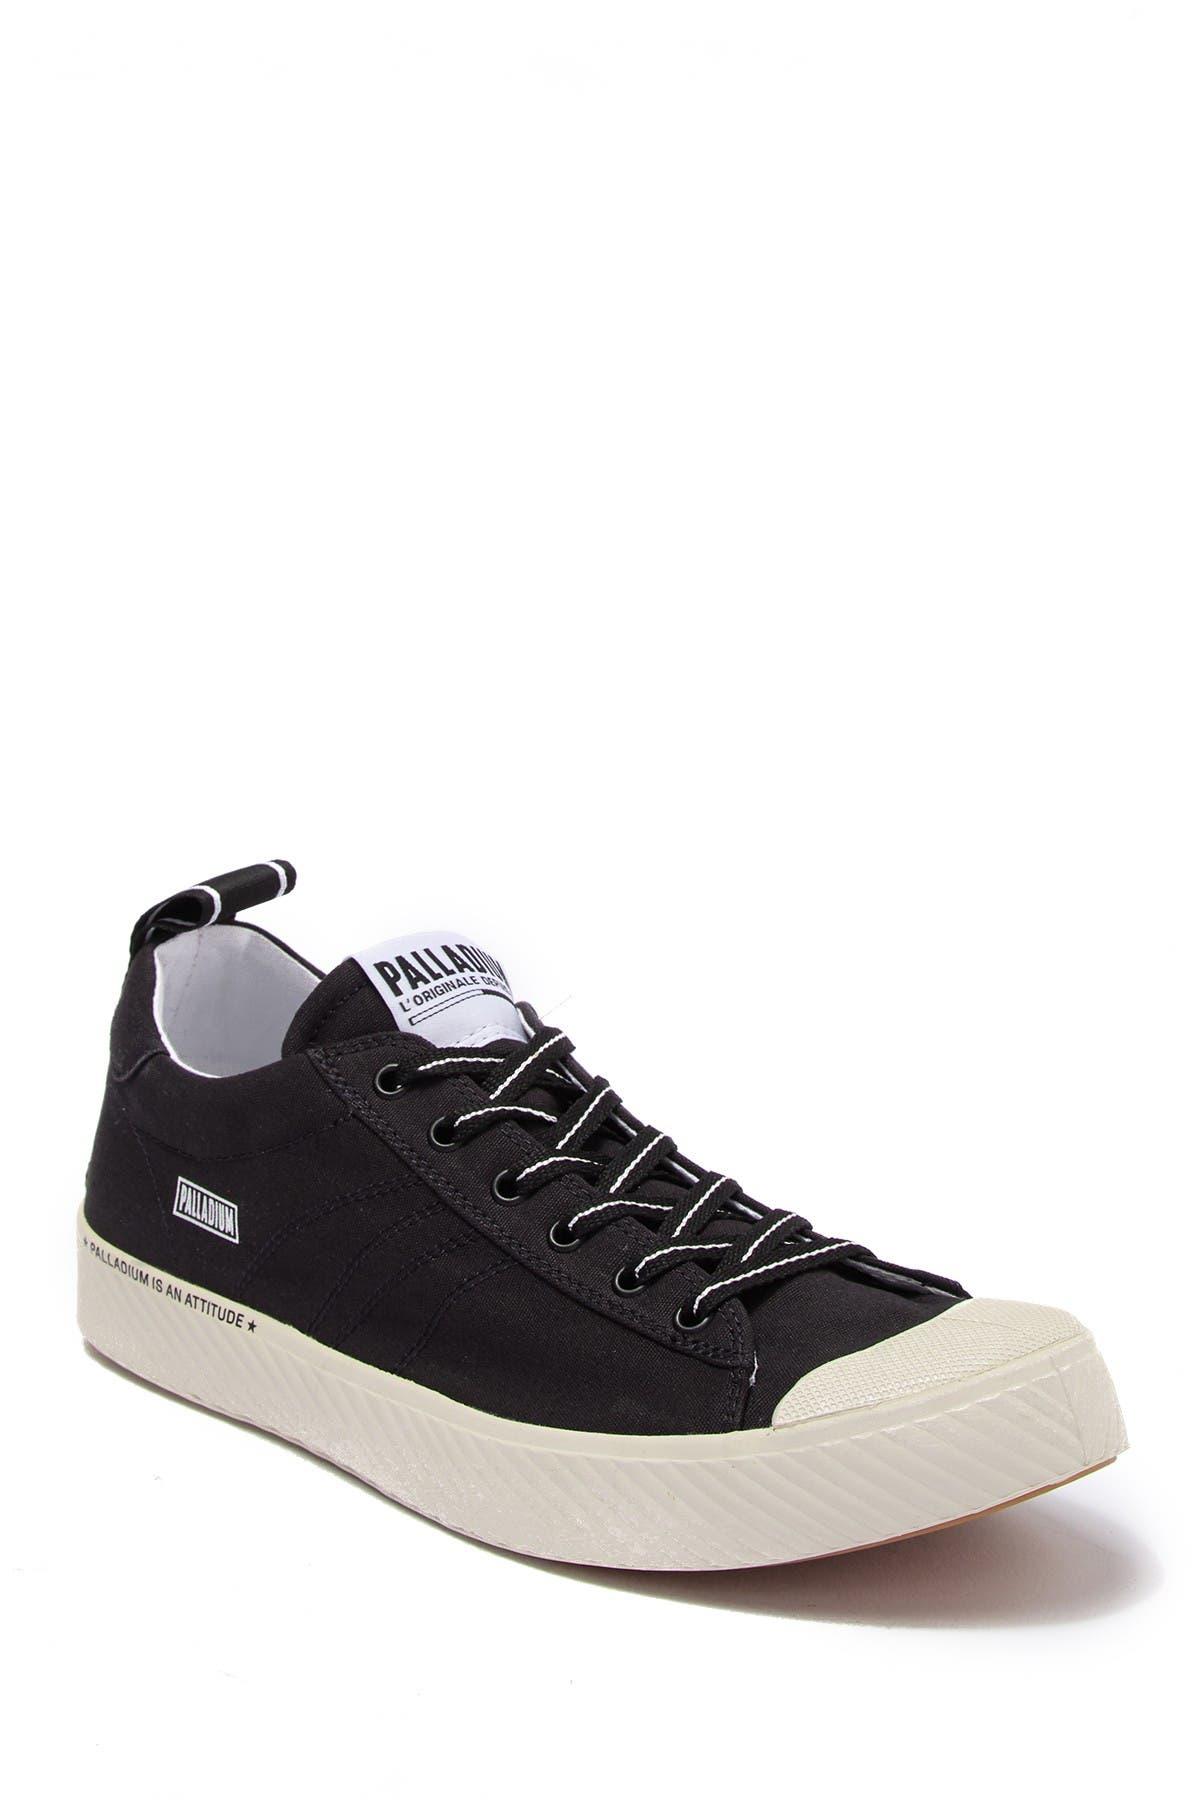 Image of PALLADIUM Palla Pheonix Sneaker